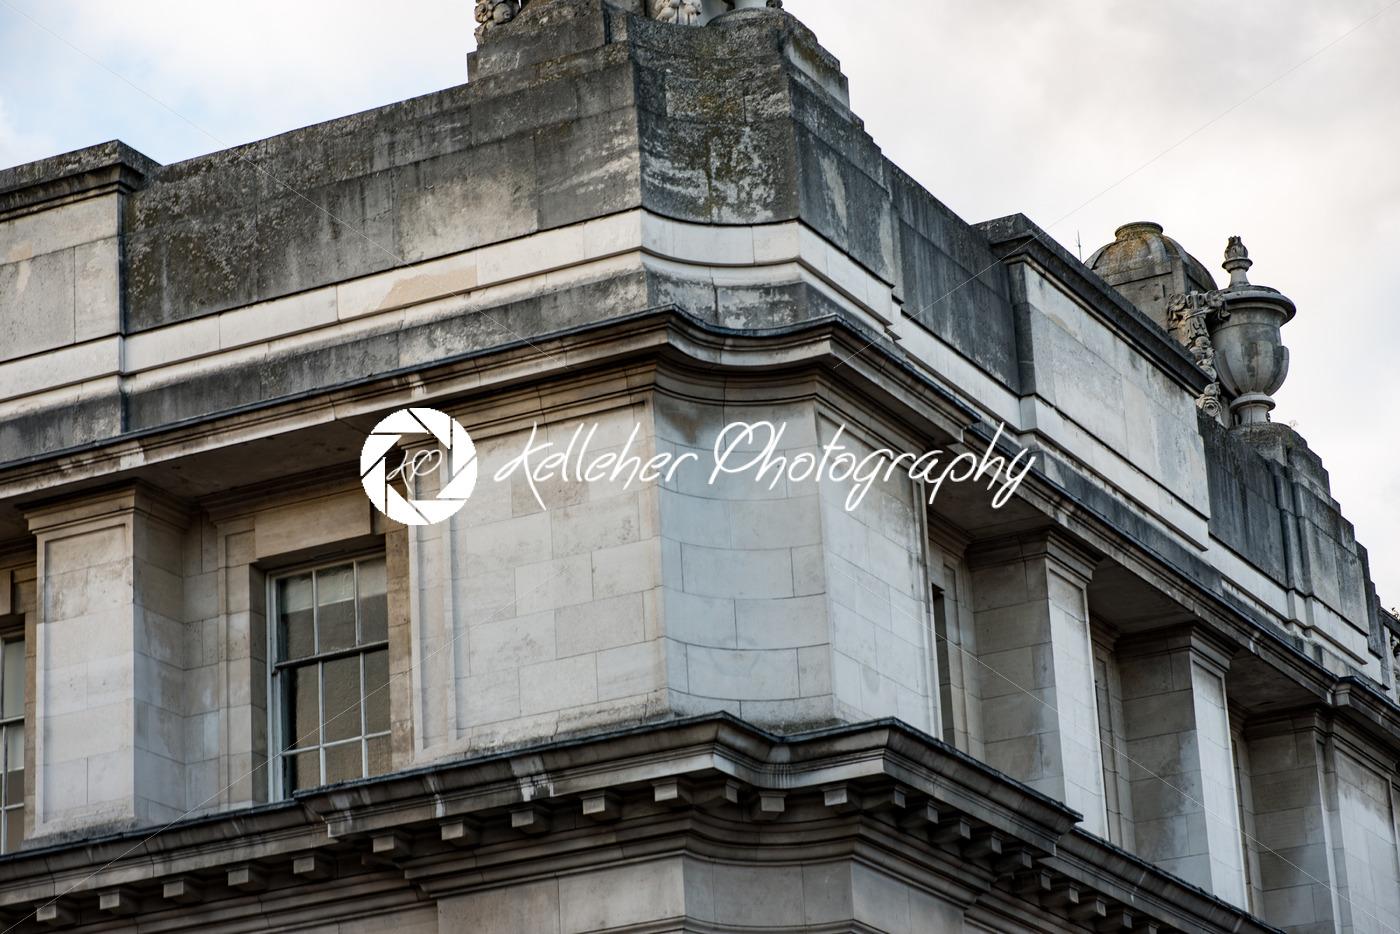 DUBLIN, IRELAND – AUGUST 30, 2017: City of Dublin Ireland - Kelleher Photography Store